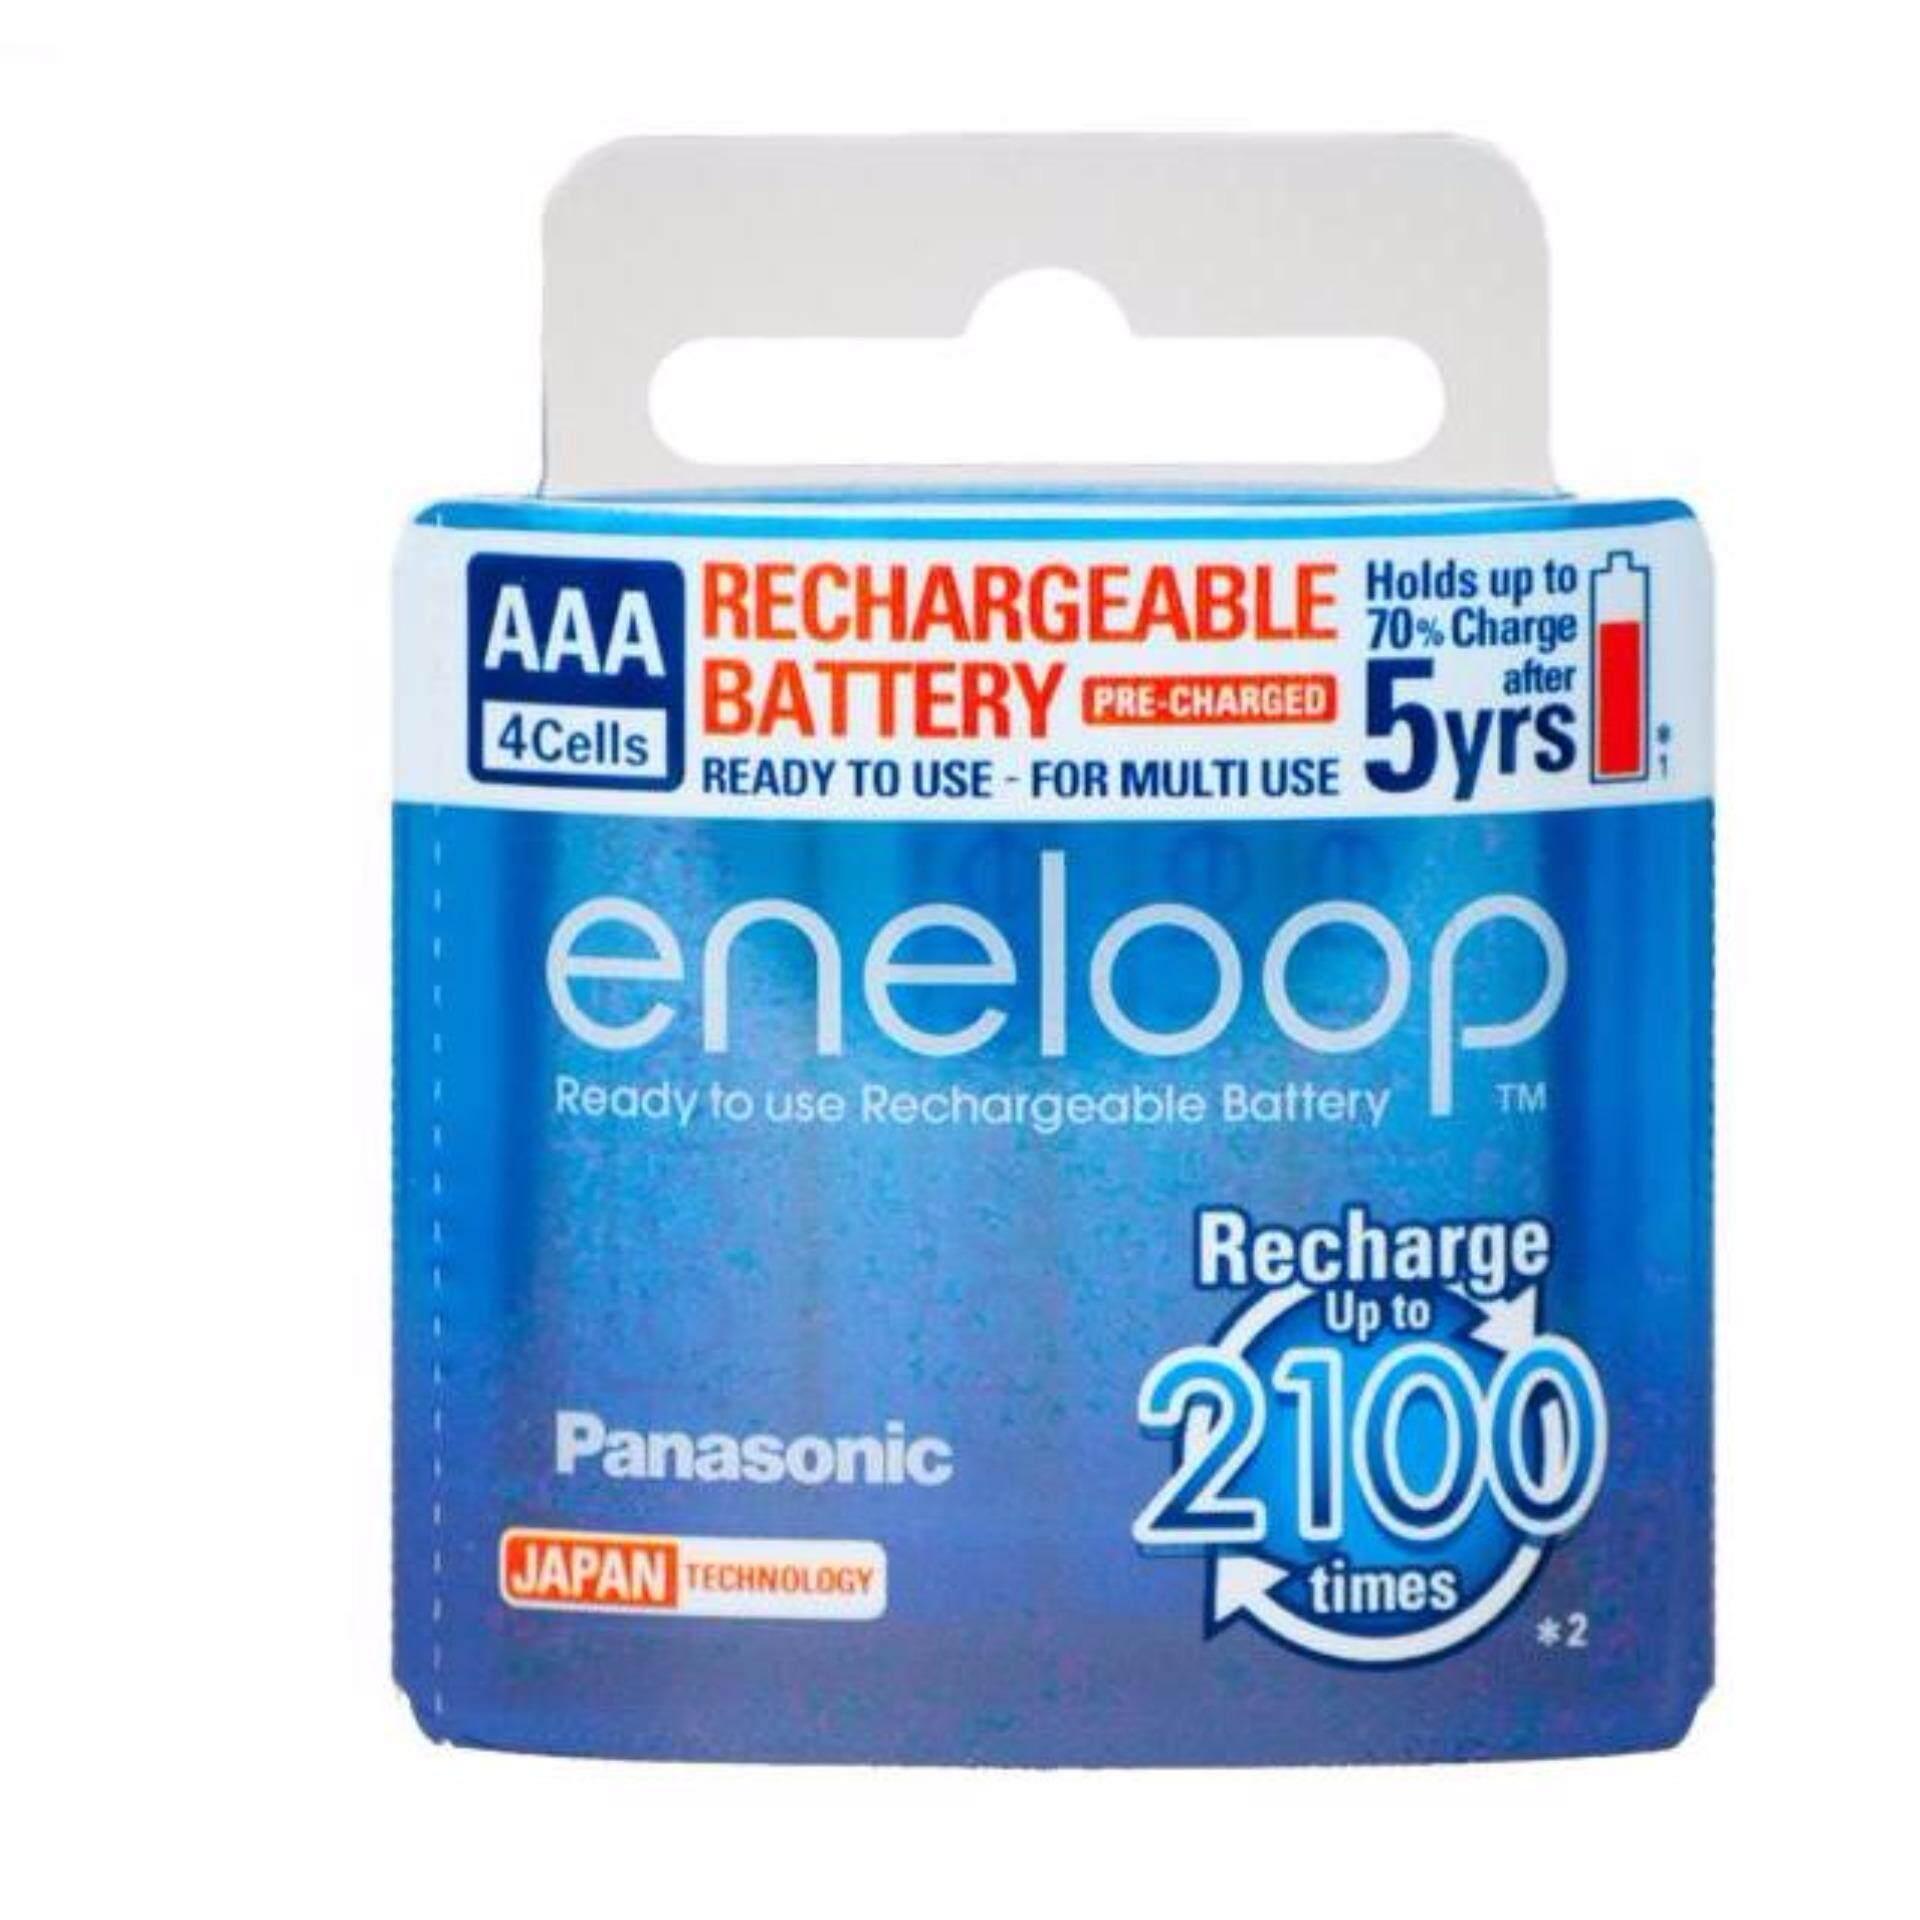 Panasonic ถ่านชาร์จ Eneloop AAA (4 ก้อน) ผลิตรุ่นปี 2017